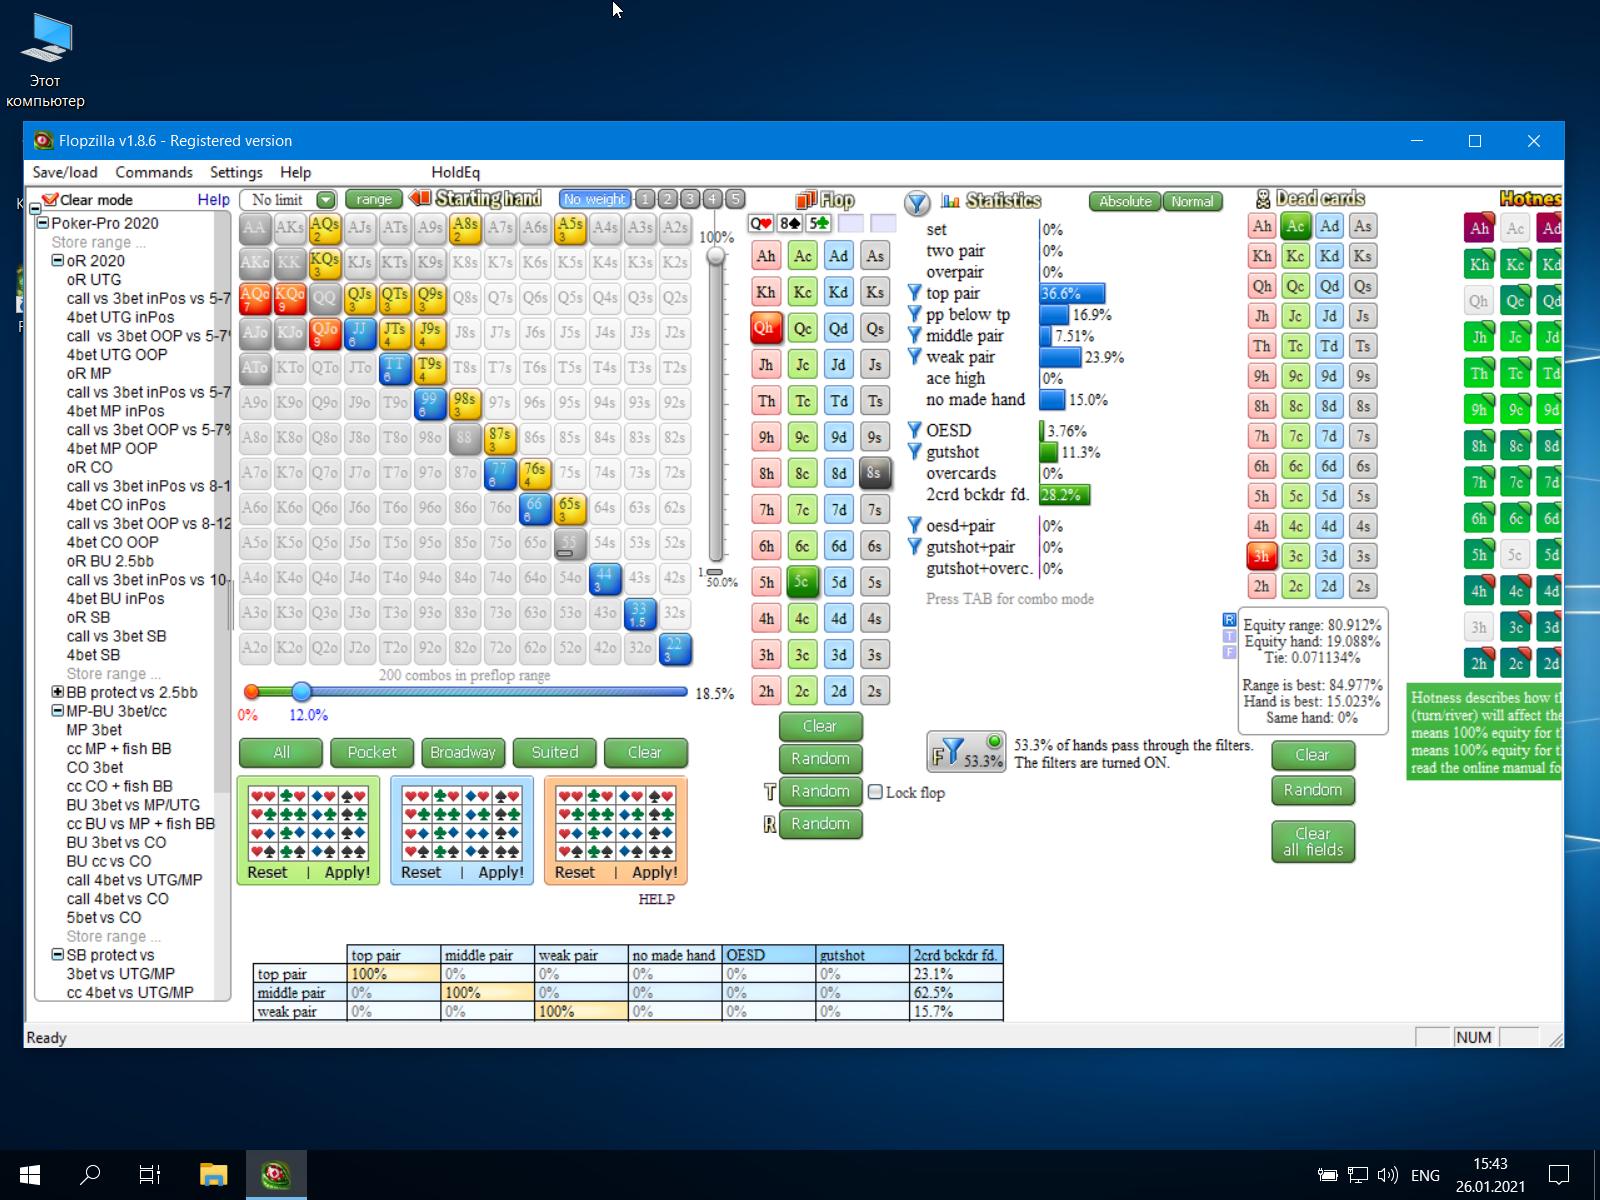 virtualboxwin-10260120211543221611665017.png